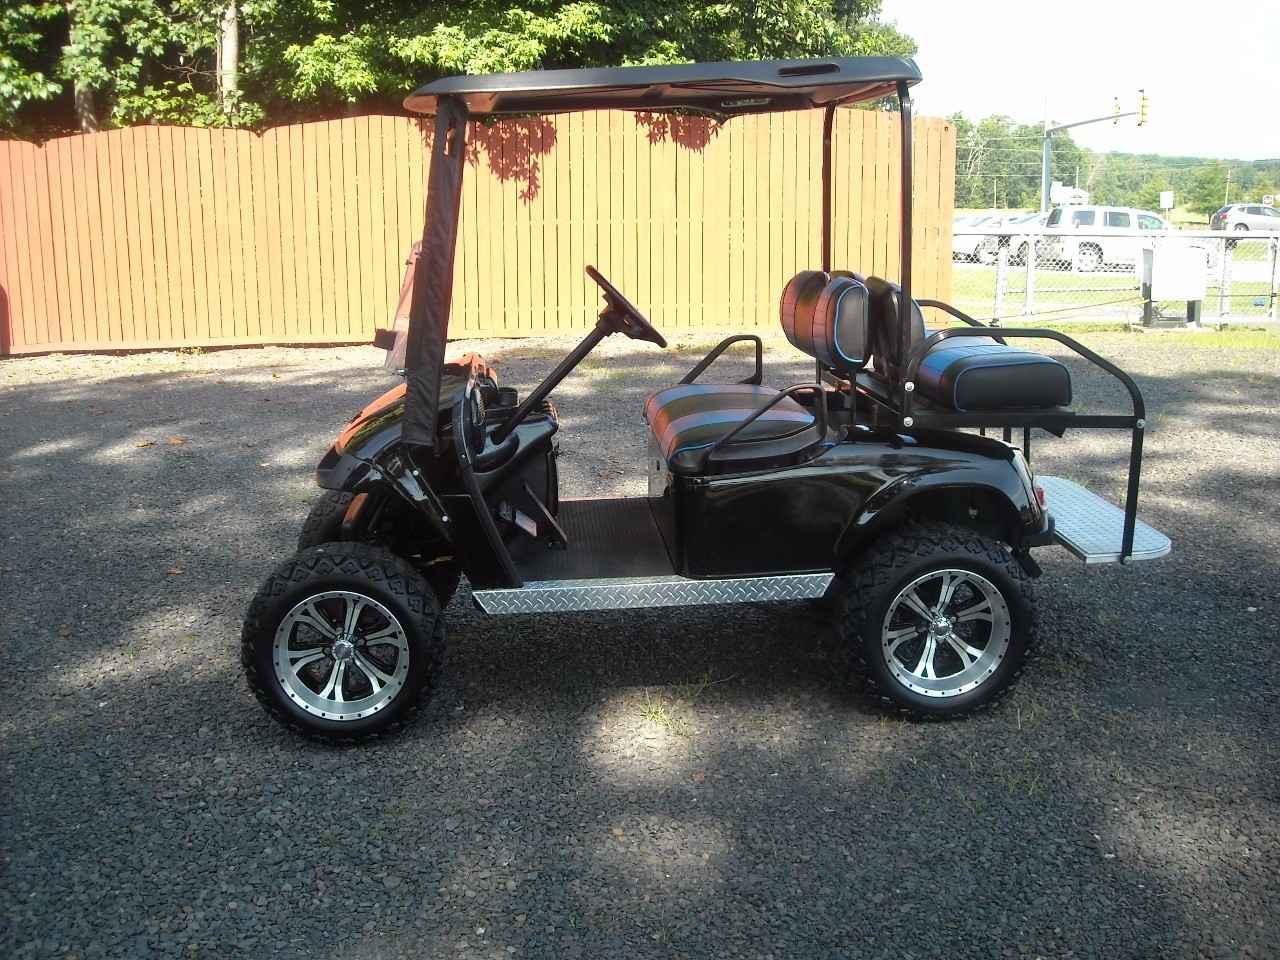 E Z Go atvs for sale on atvtrades.com Ezgo Volt Golf Cart Sd on ezgo 48 volt conversion kit, ezgo 36 volt golf cart, used club car golf cart,